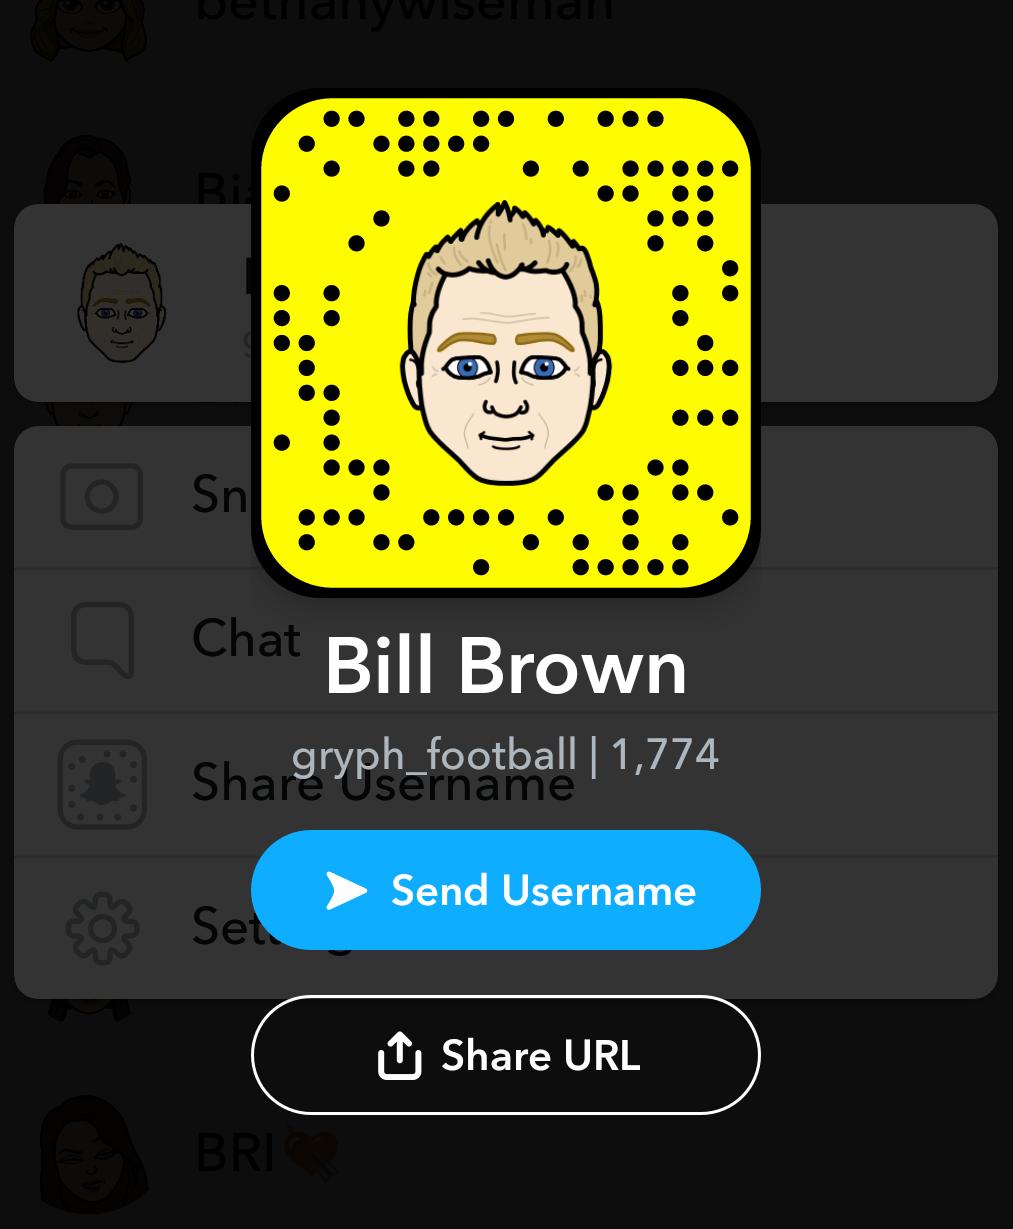 https://www.snapchat.com/add/gryph_football